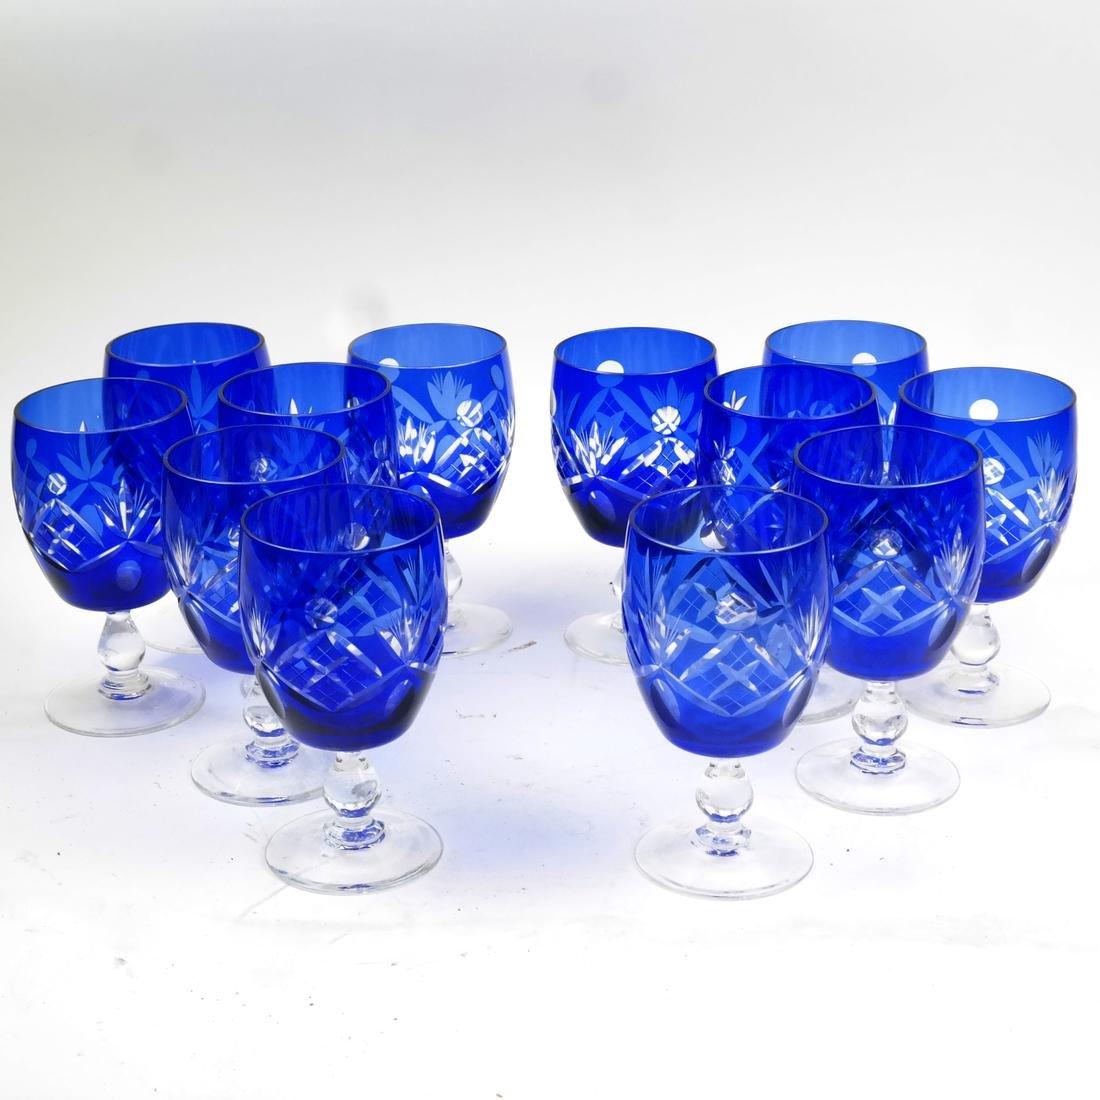 Stemware, Set of 12 Cobalt Blue Glasses